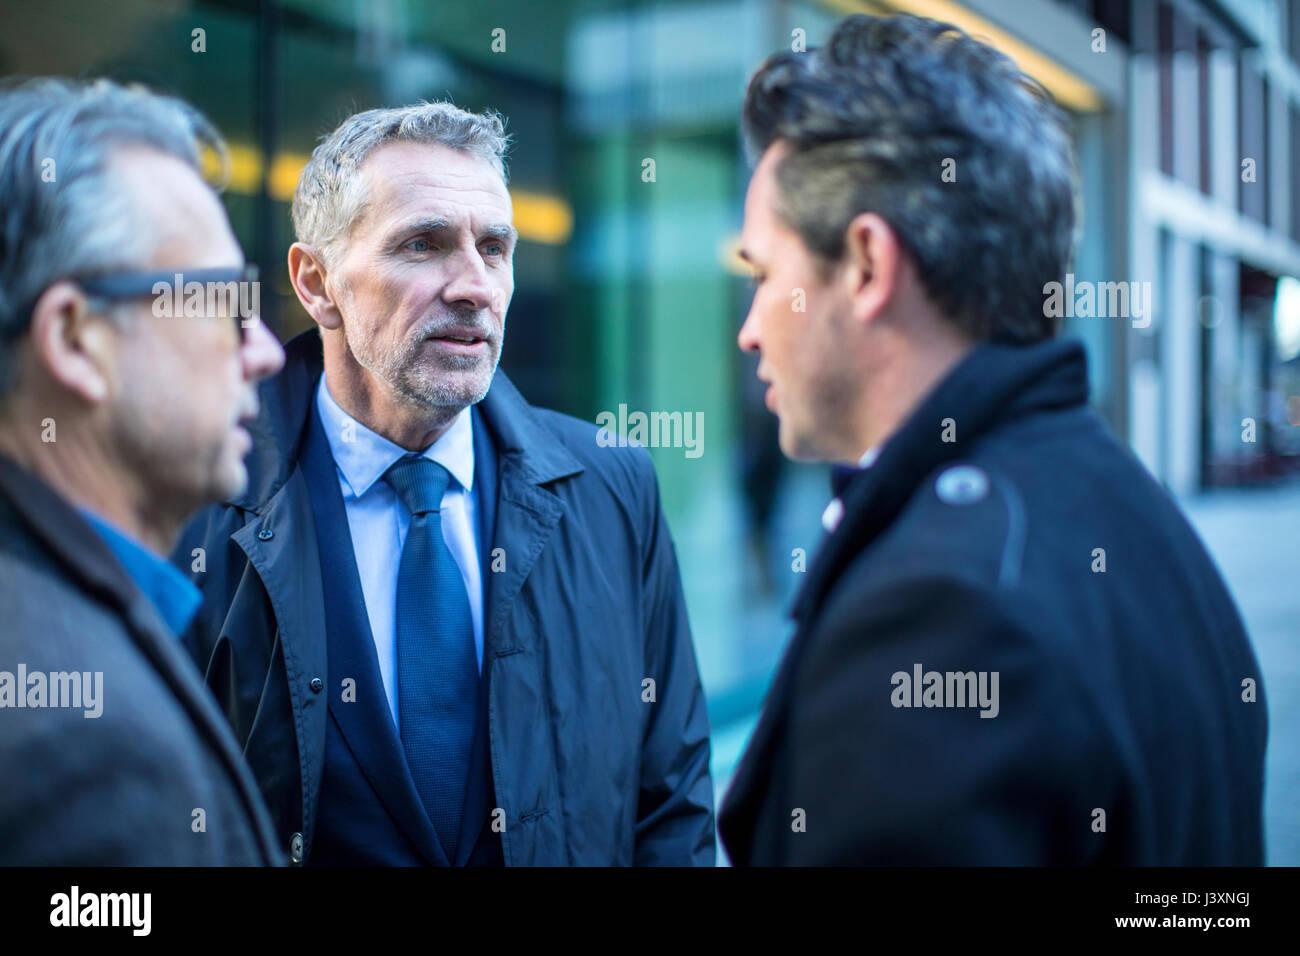 Businessmen in street talking - Stock Image